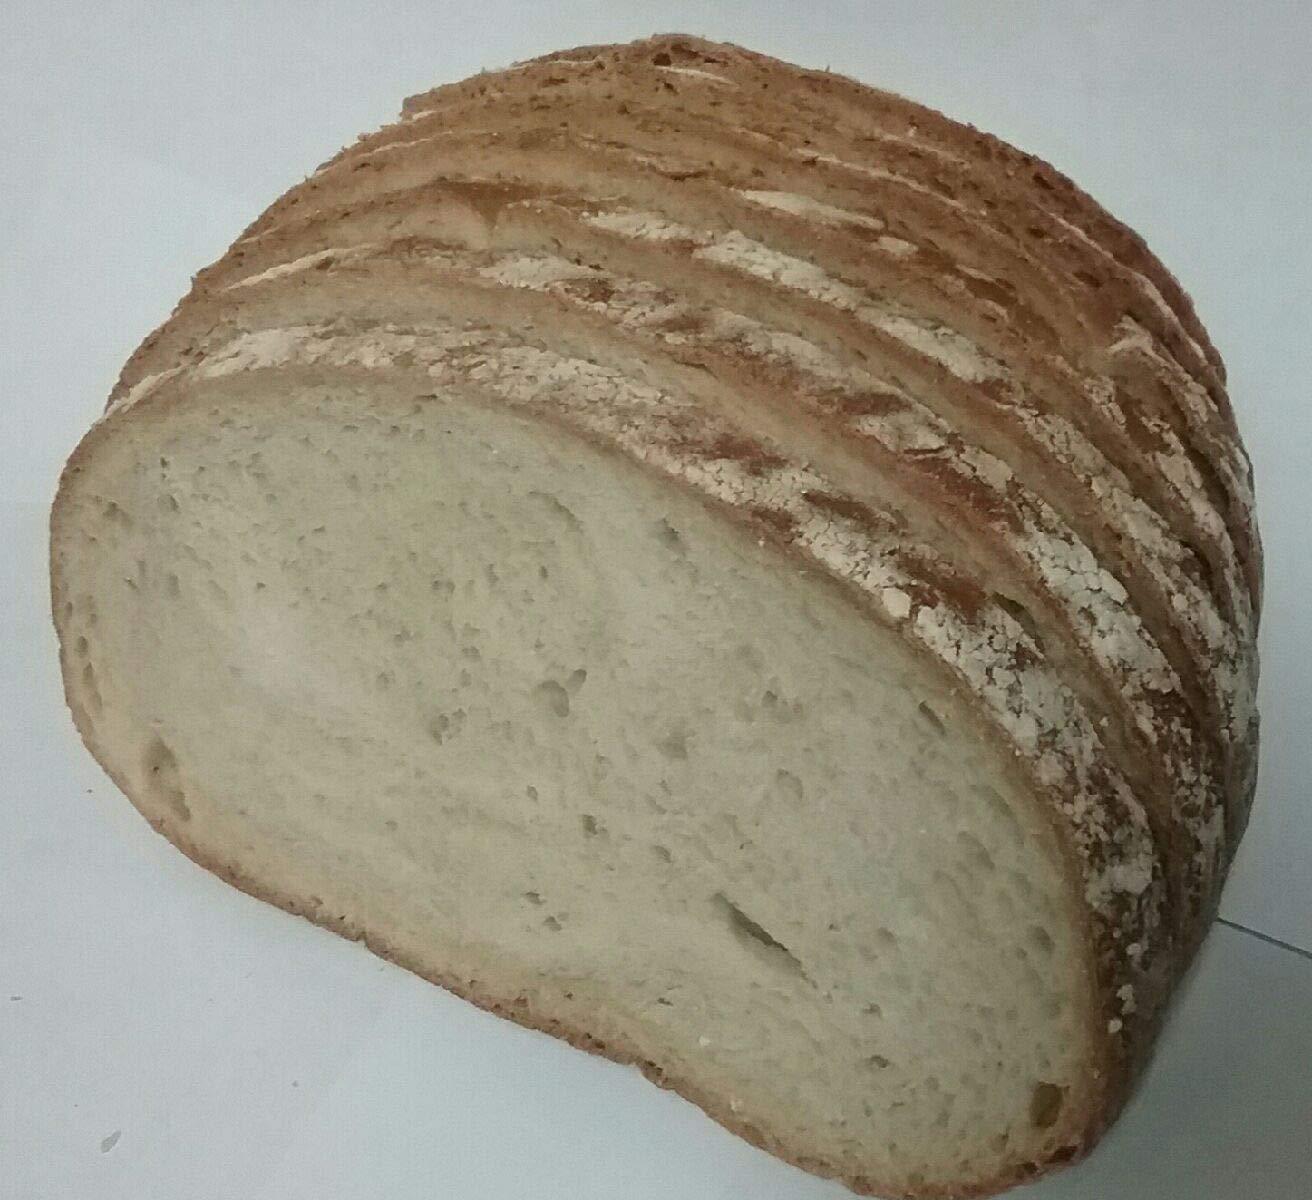 Granny's Homemade Boiled Bread ''Bagel Bread'' Pack of 4 (1.1 Lb Each)